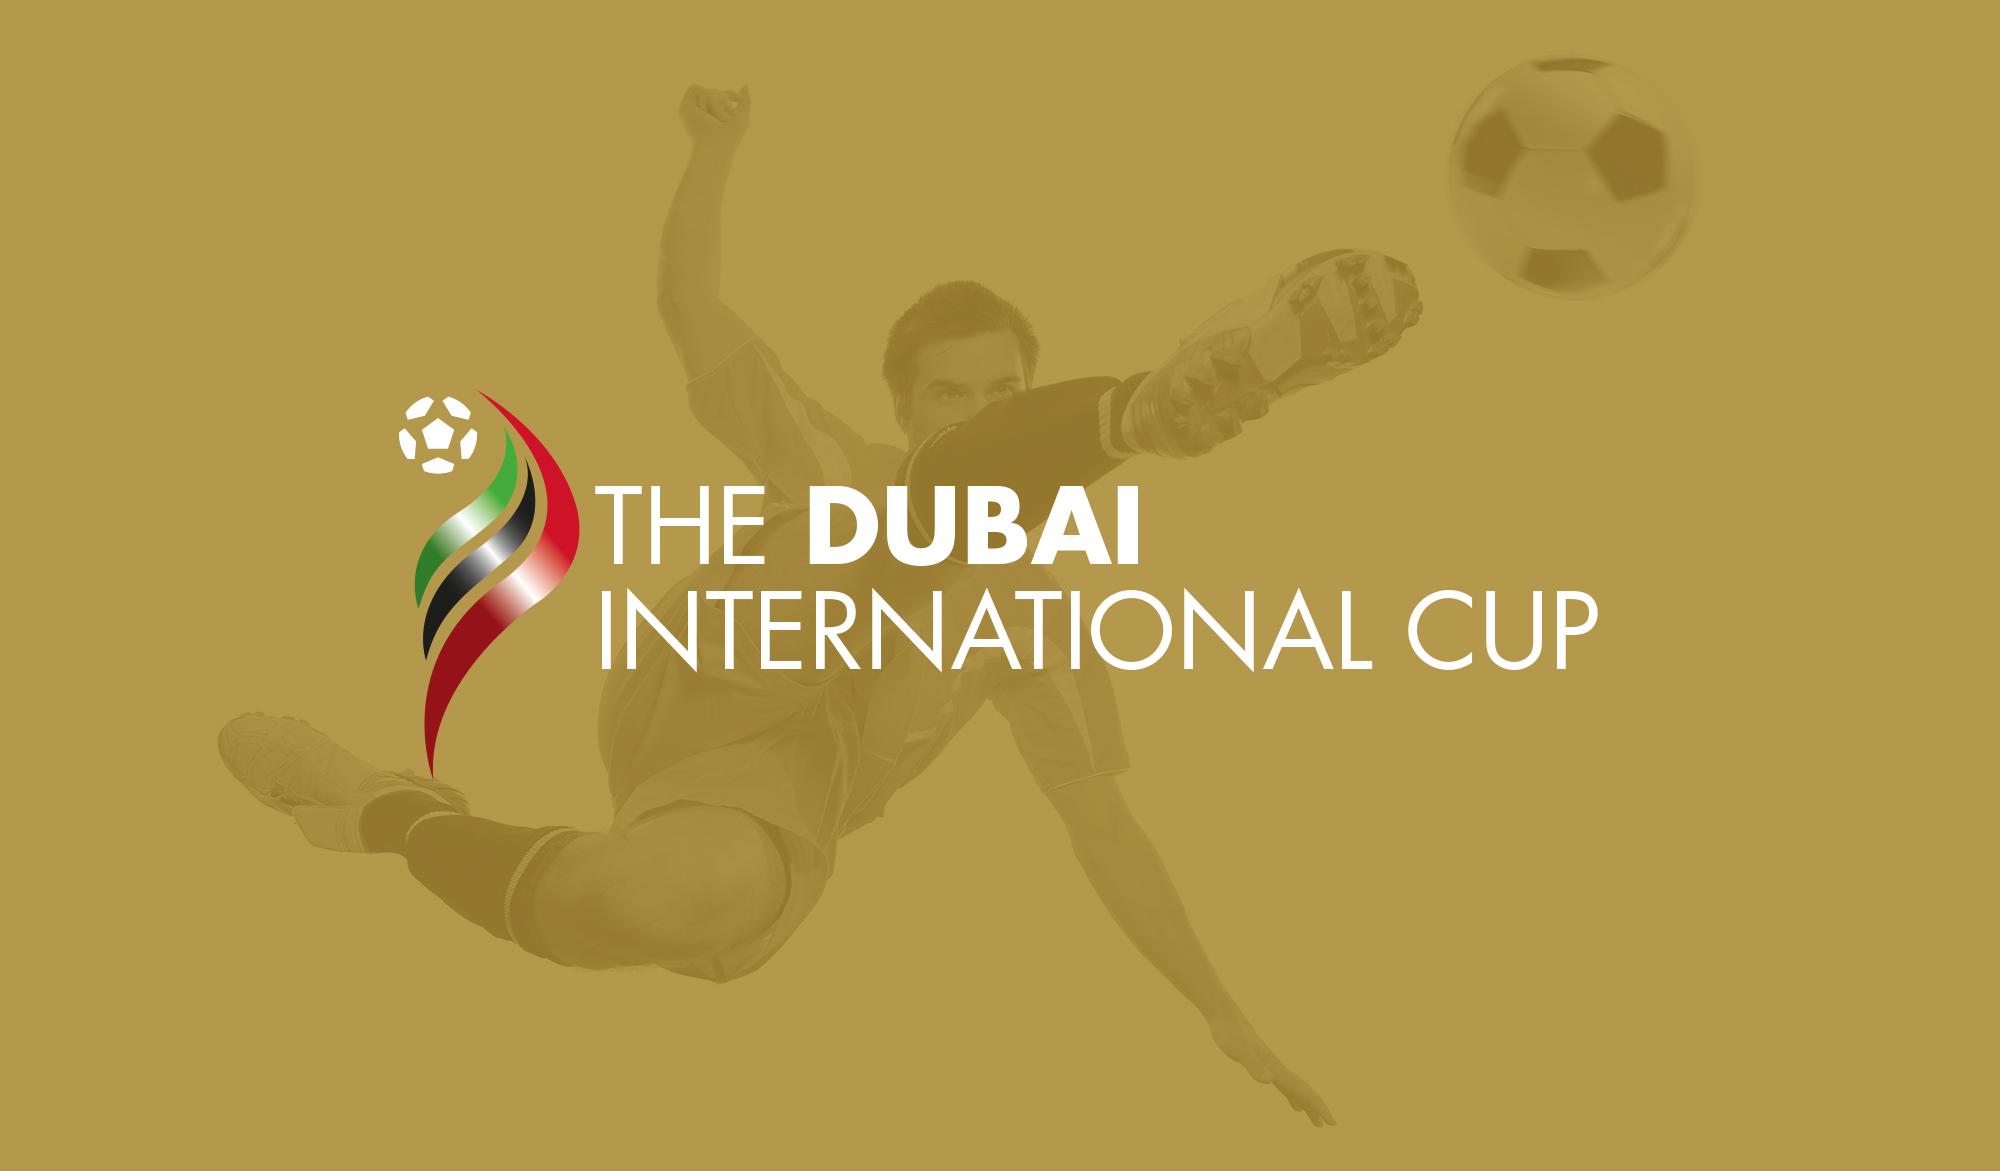 The Dubai International Cup logo